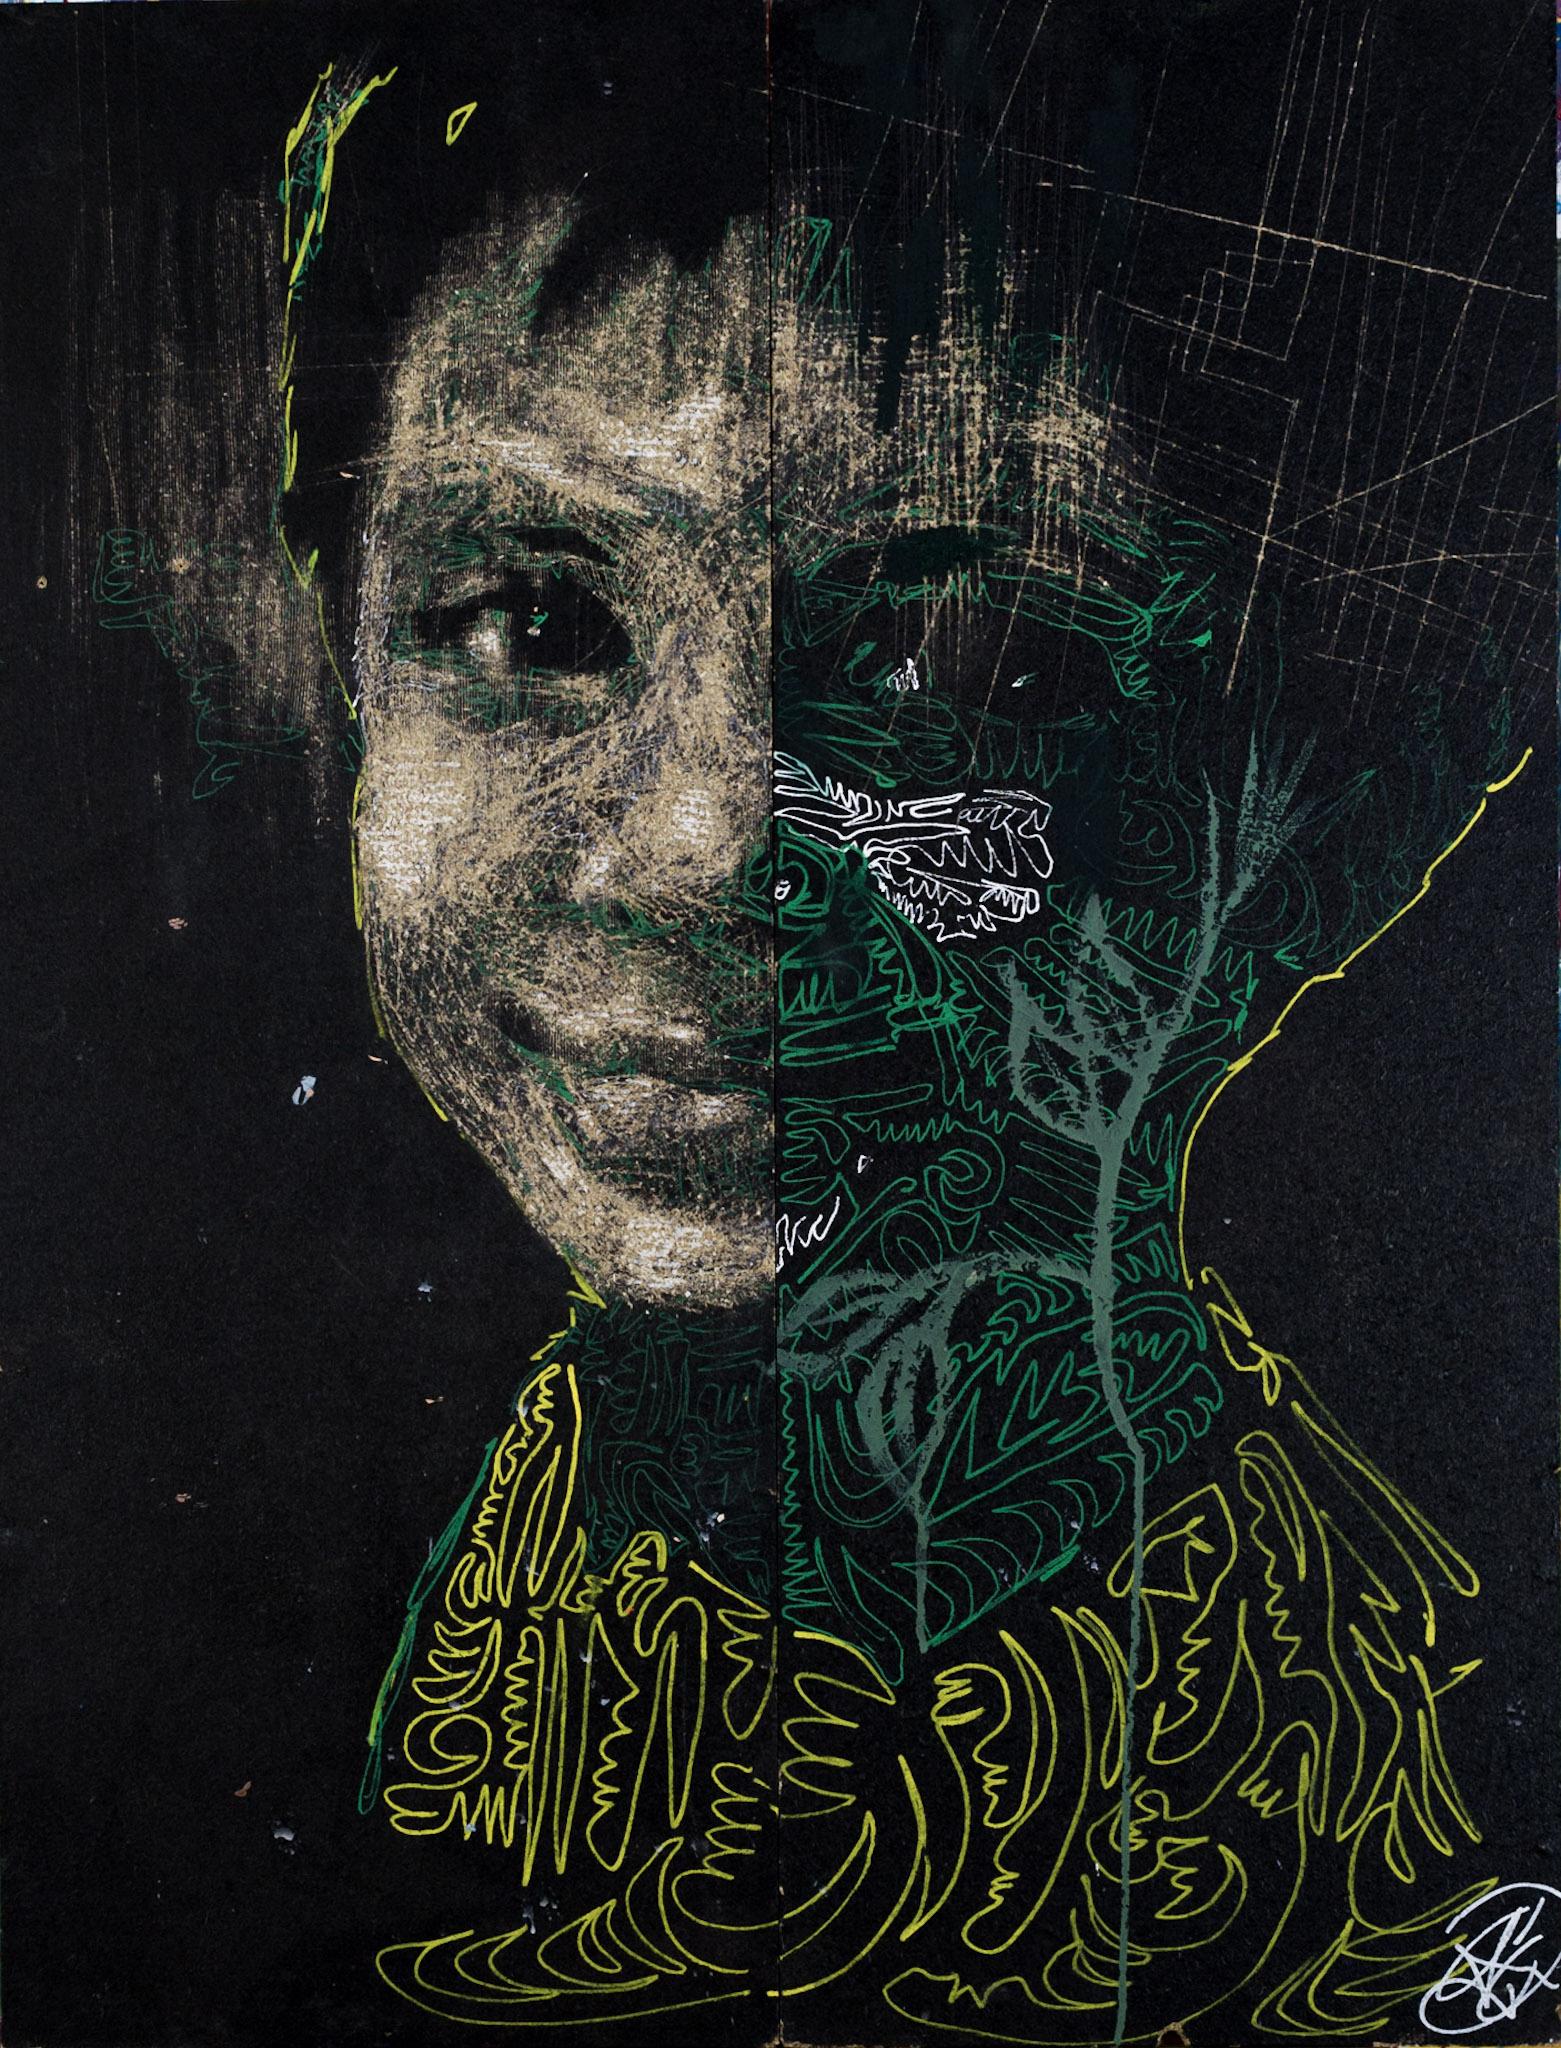 Guaratingeta d'Henri Lamy (100 x 50cm), 2500 euros